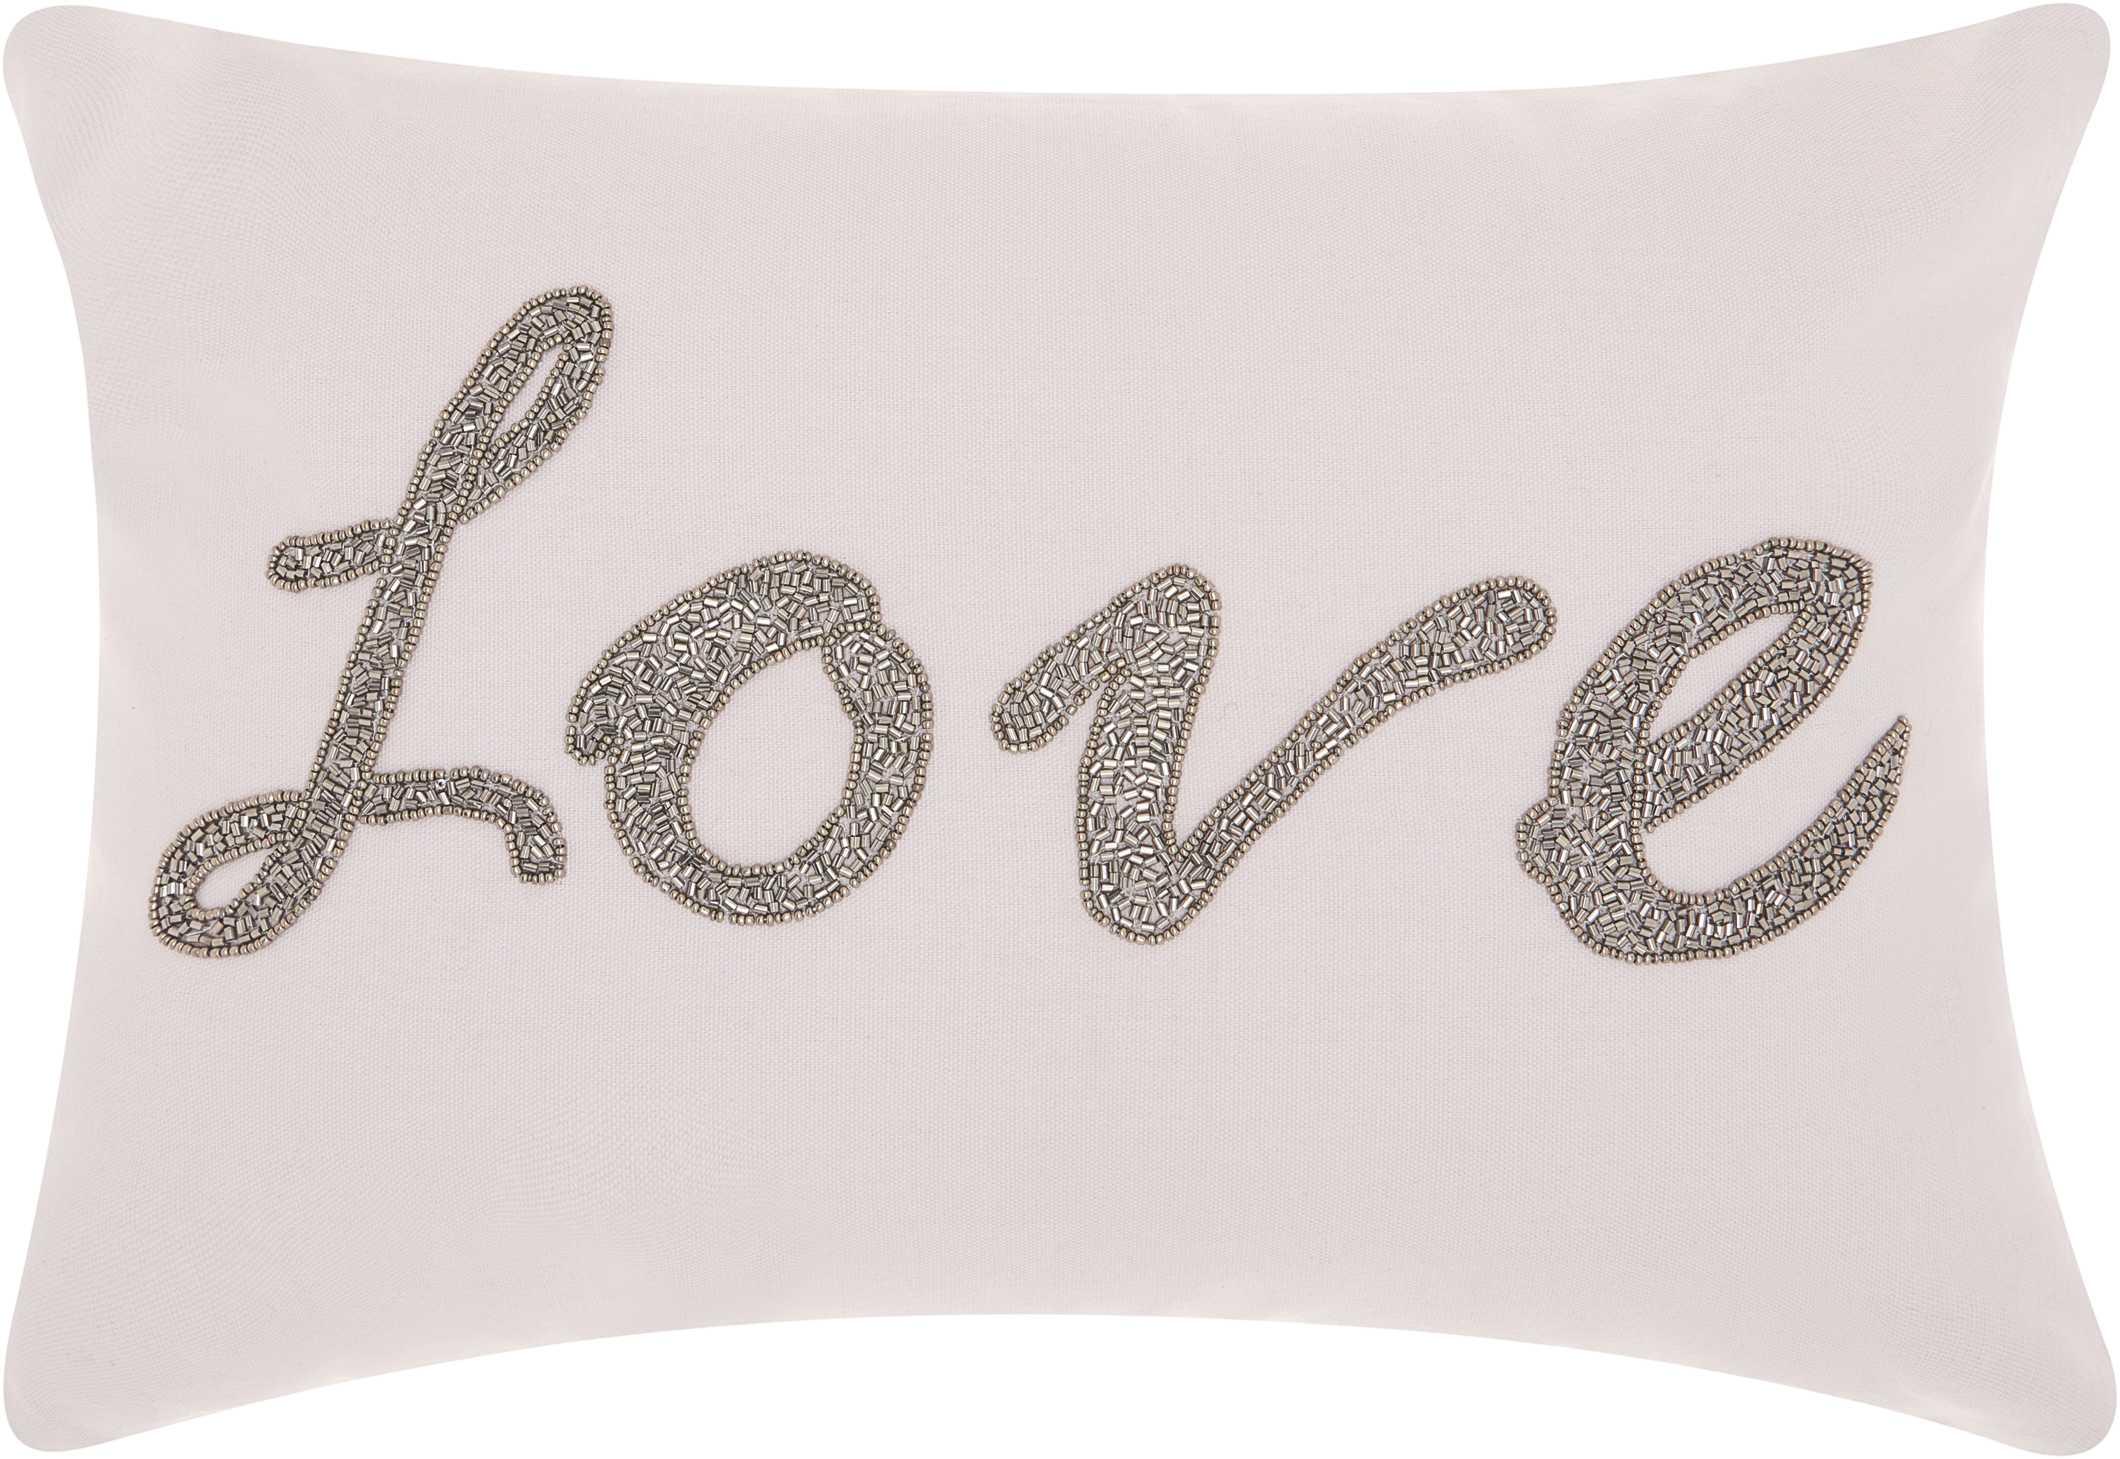 Nourison Mina Victory Mina Victory E0953 Pewter Decorative Pillow 20 X 20